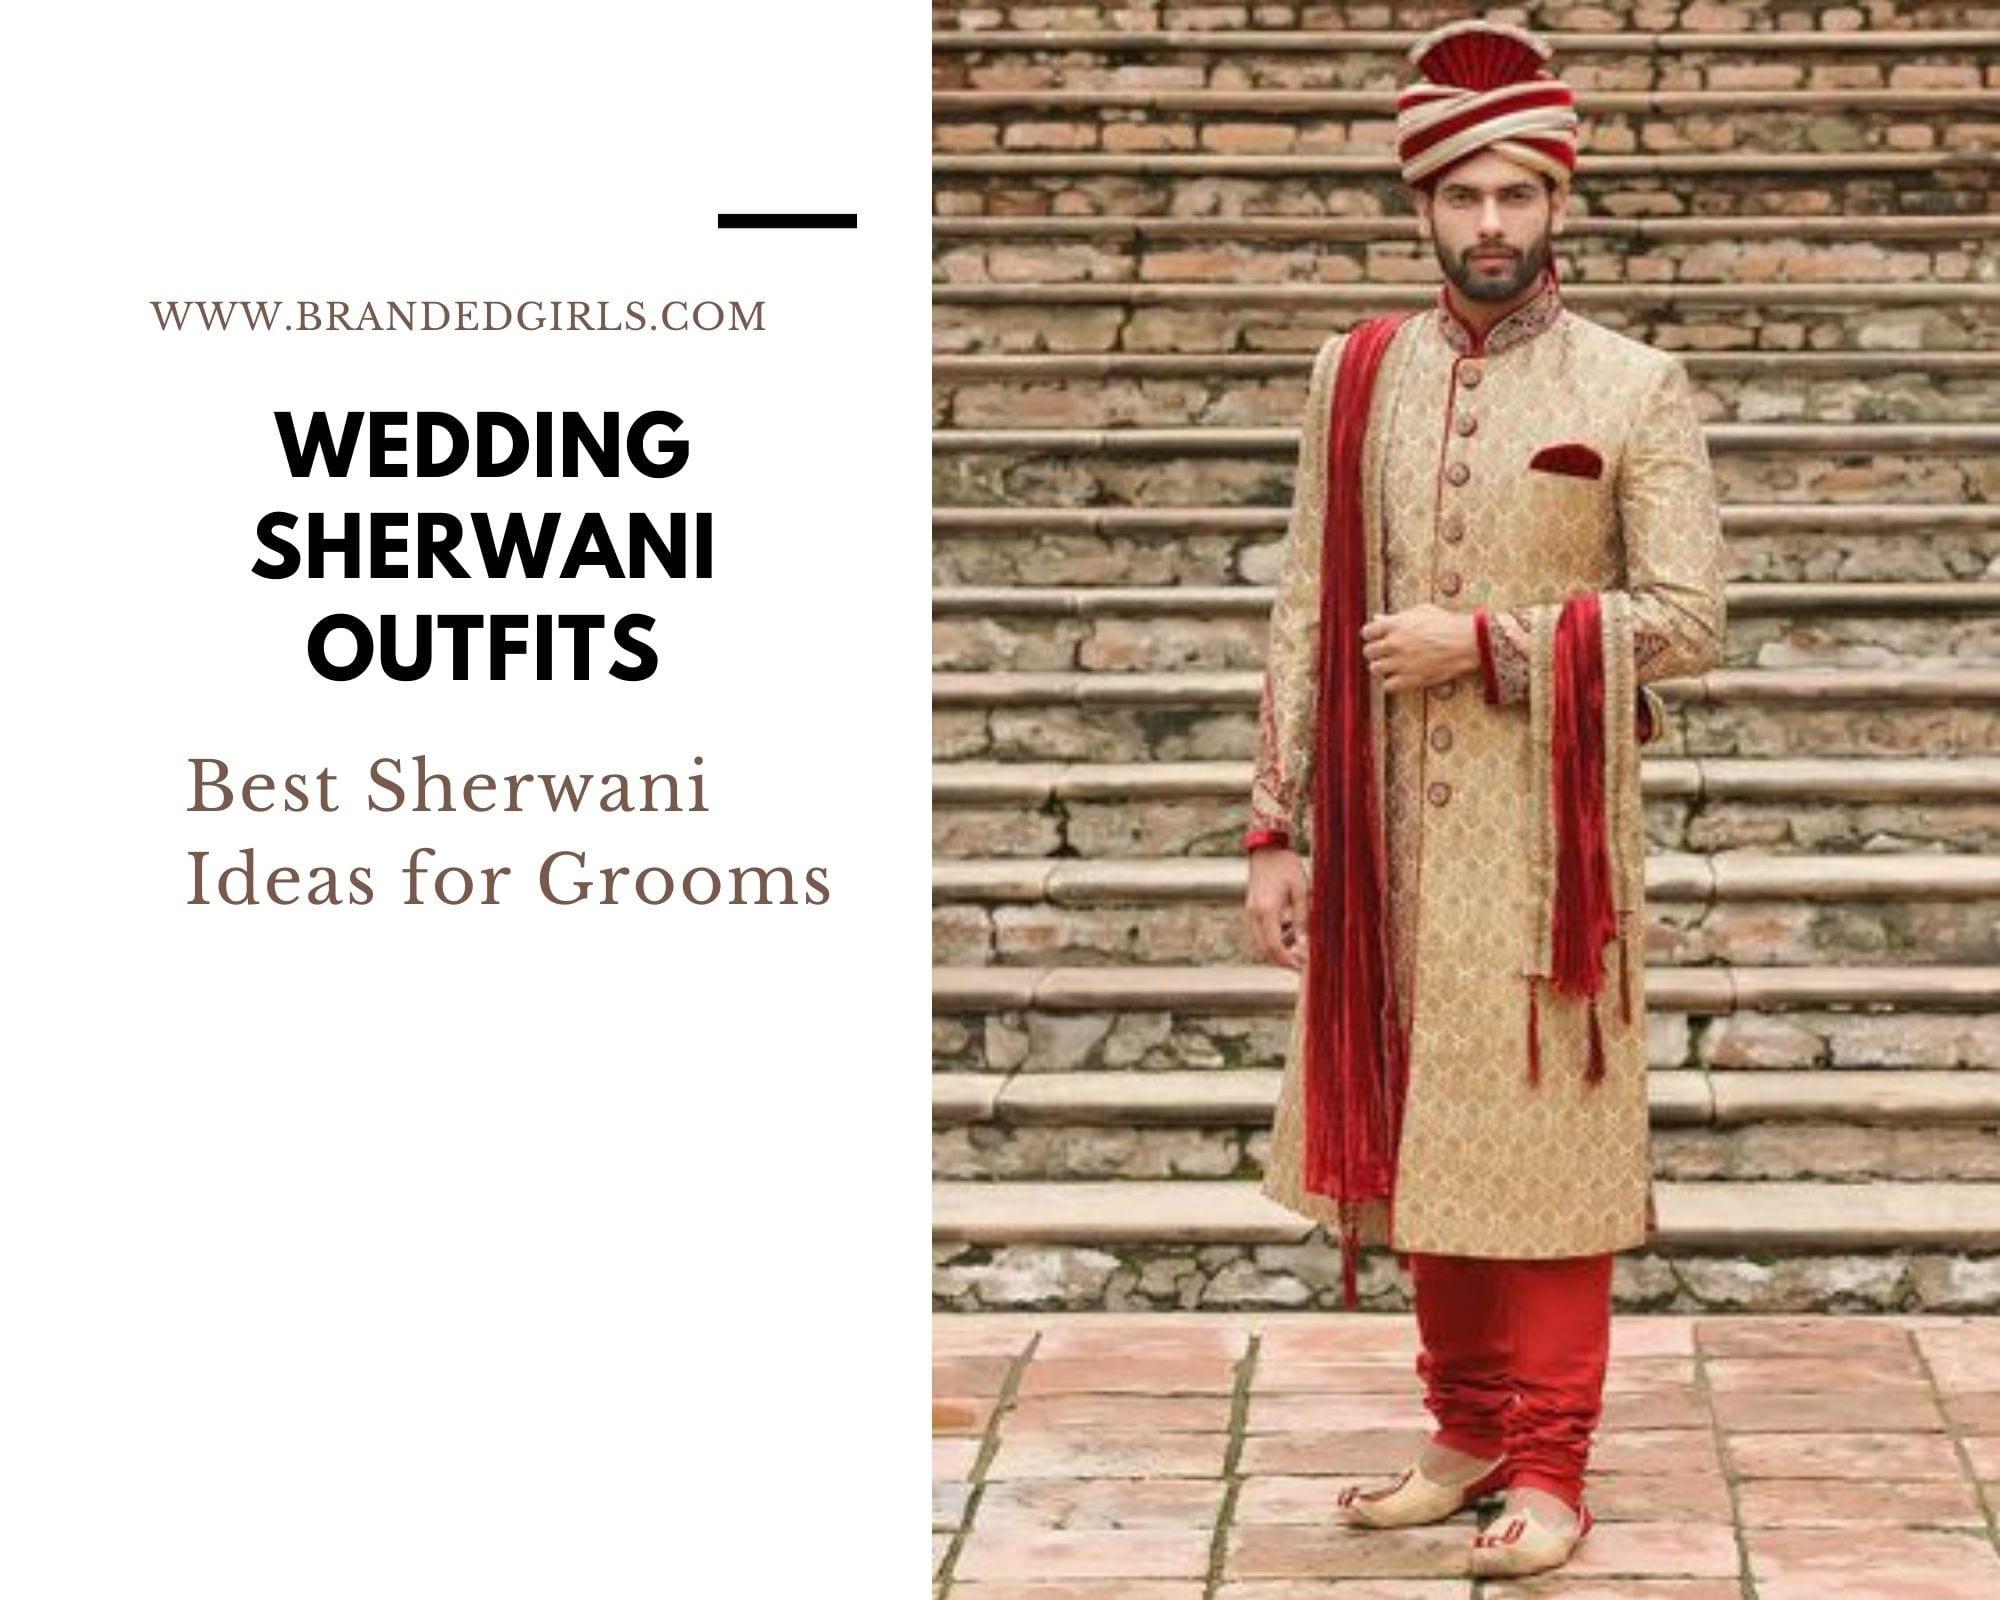 Wedding-Sherwani-Ideas Wedding Sherwani Outfits - 20 Best Sherwani Ideas for Grooms